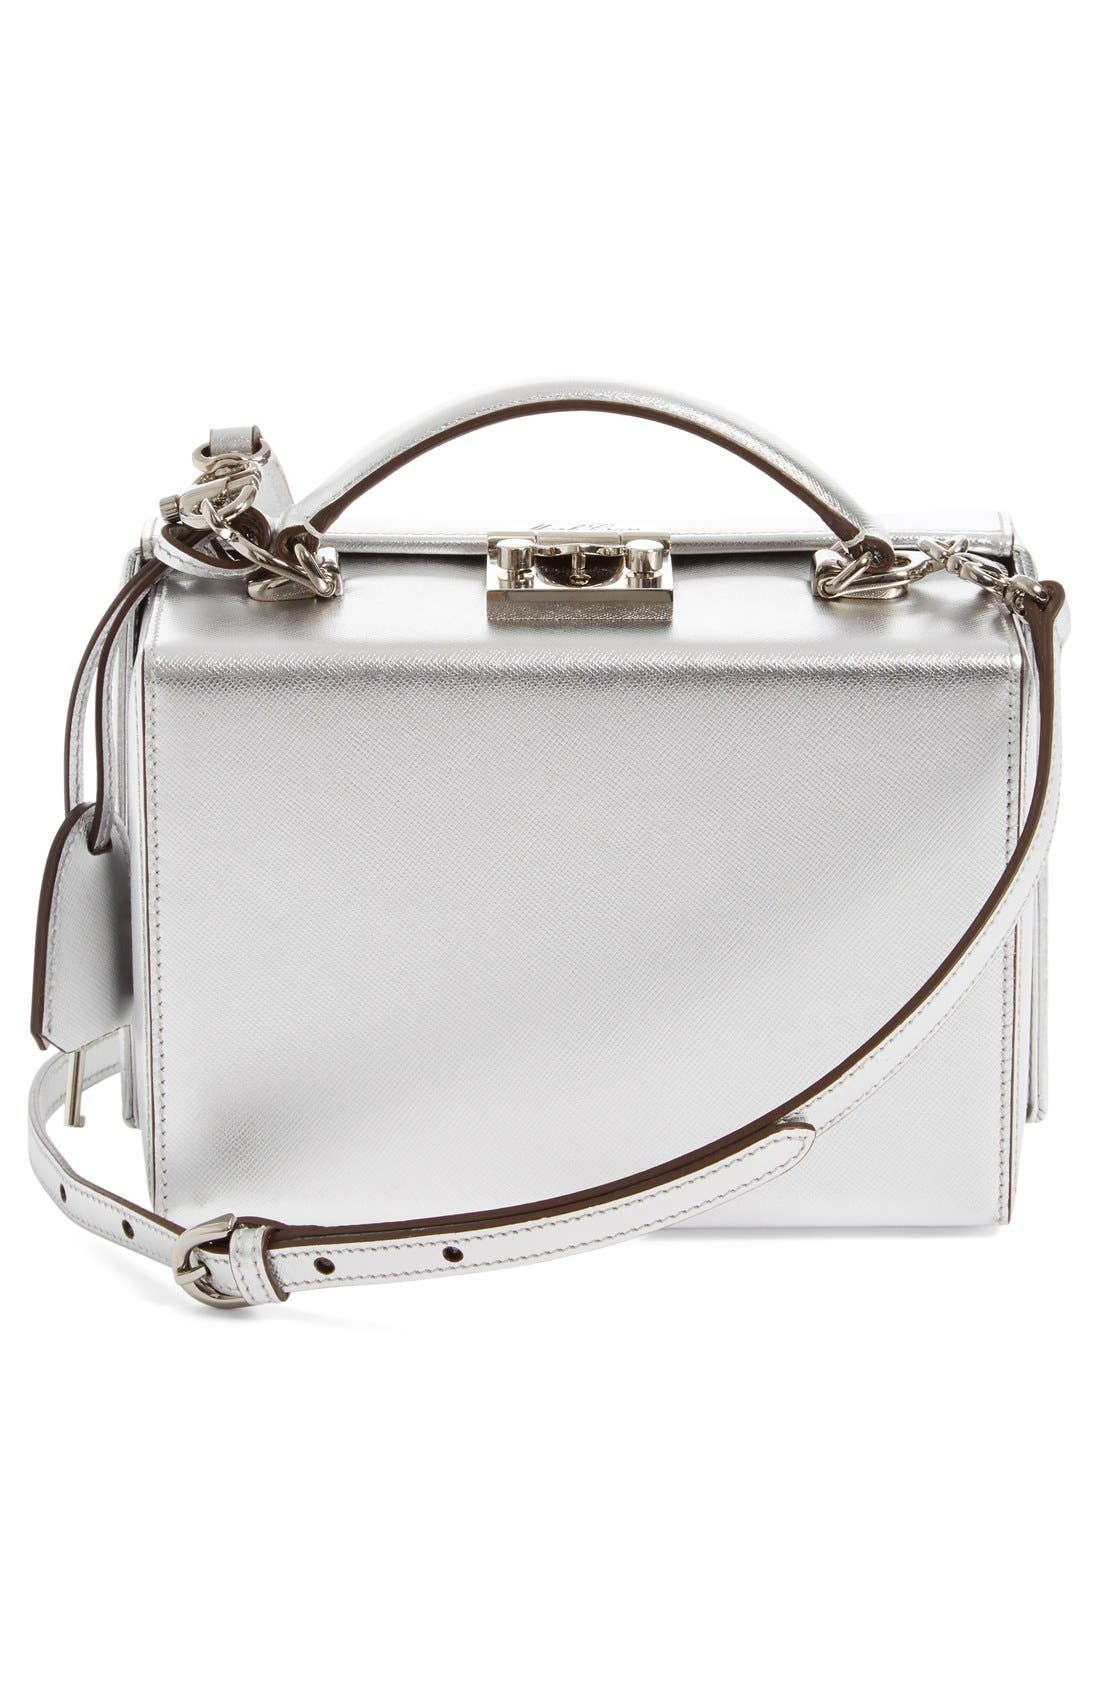 Alternate Image 2  - Mark Cross 'Small Grace' Metallic Saffiano Leather Box Clutch